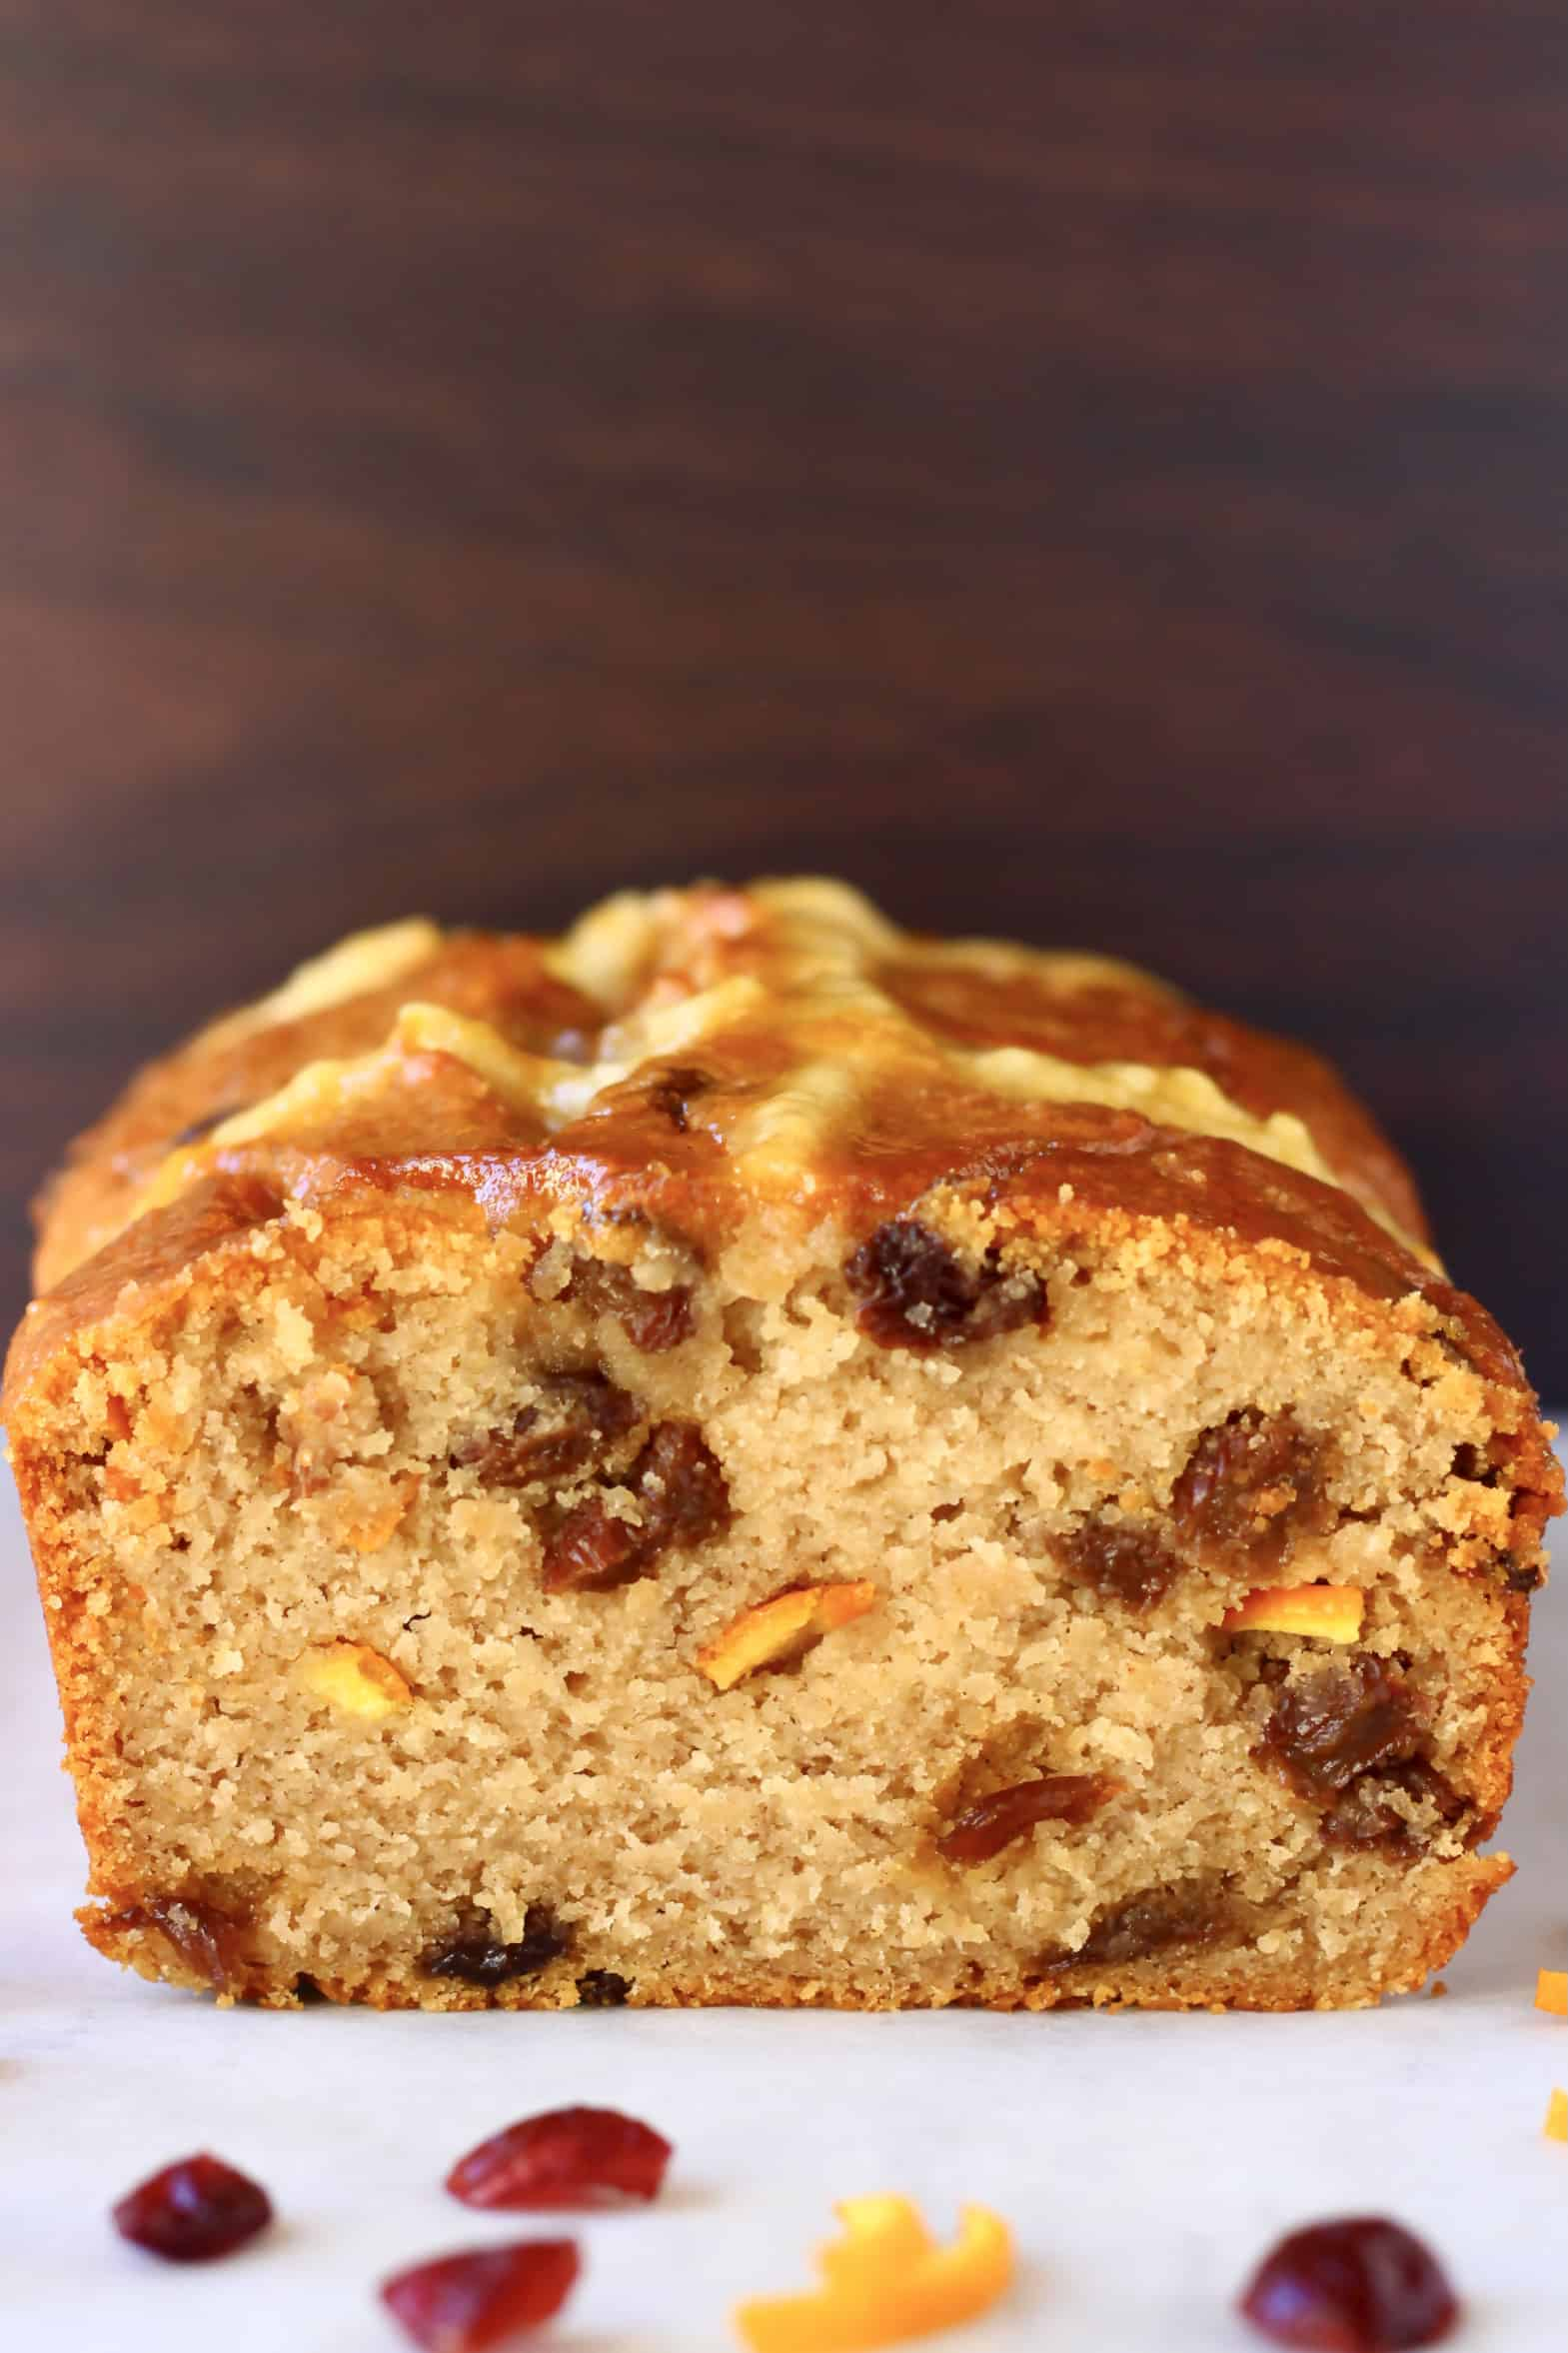 A sliced gluten-free vegan hot cross bun loaf with raisins and orange peel